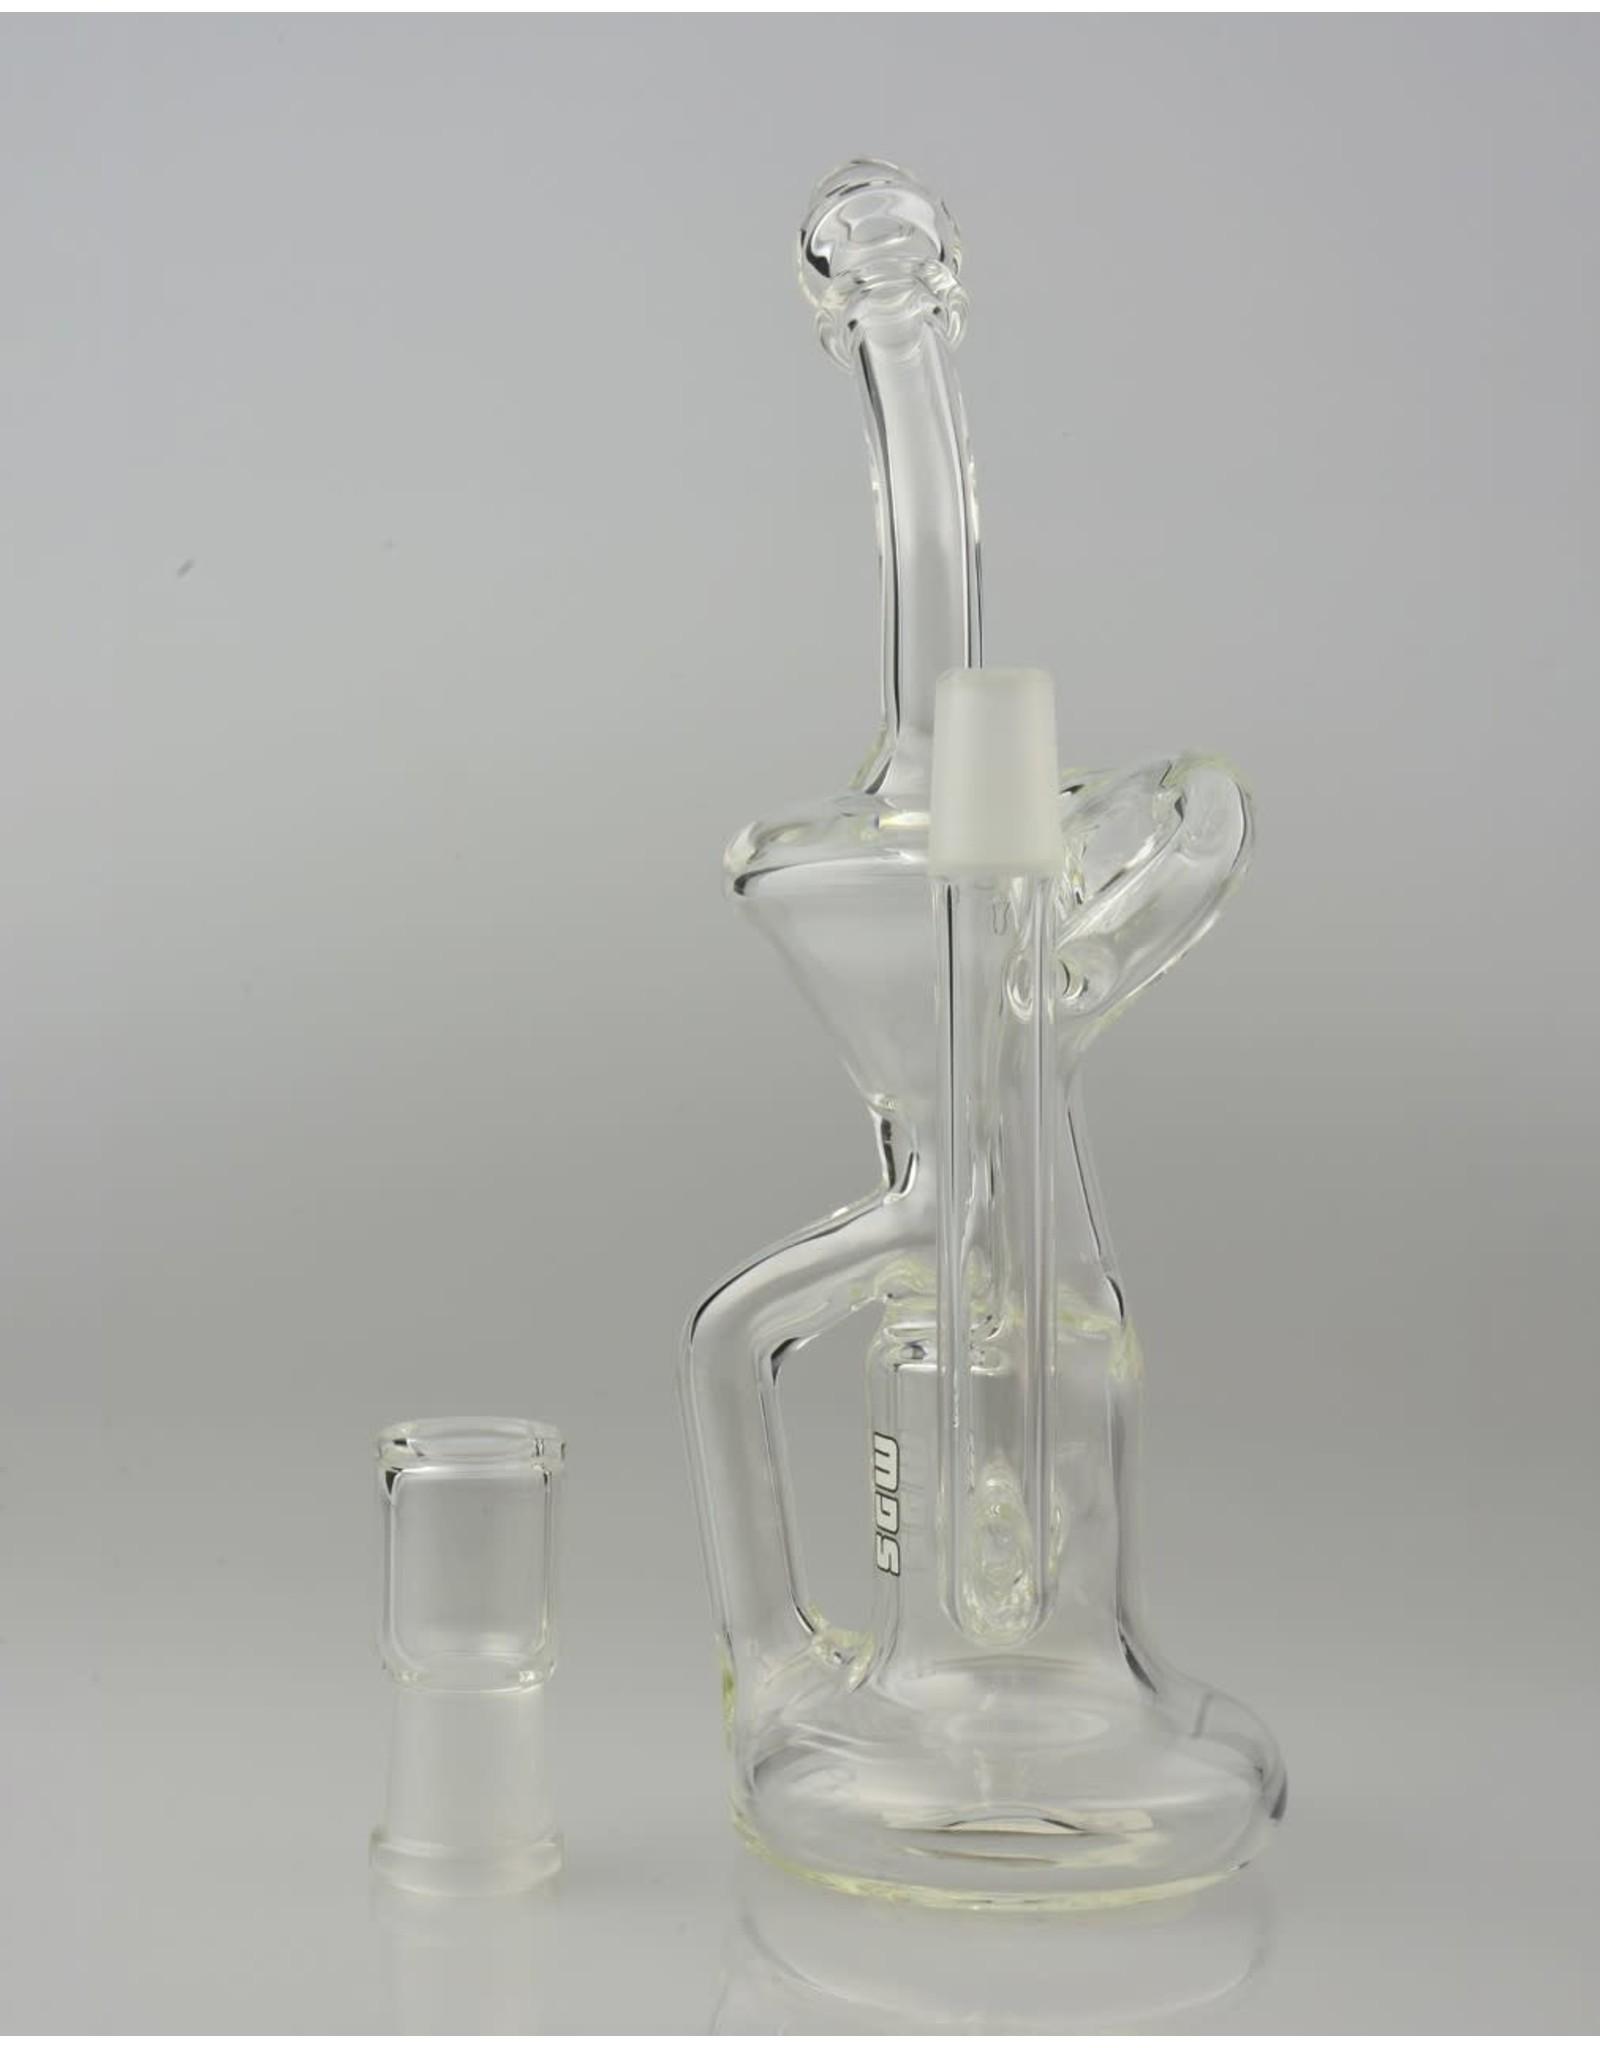 Stone Glass works Stone glass works recycler clear